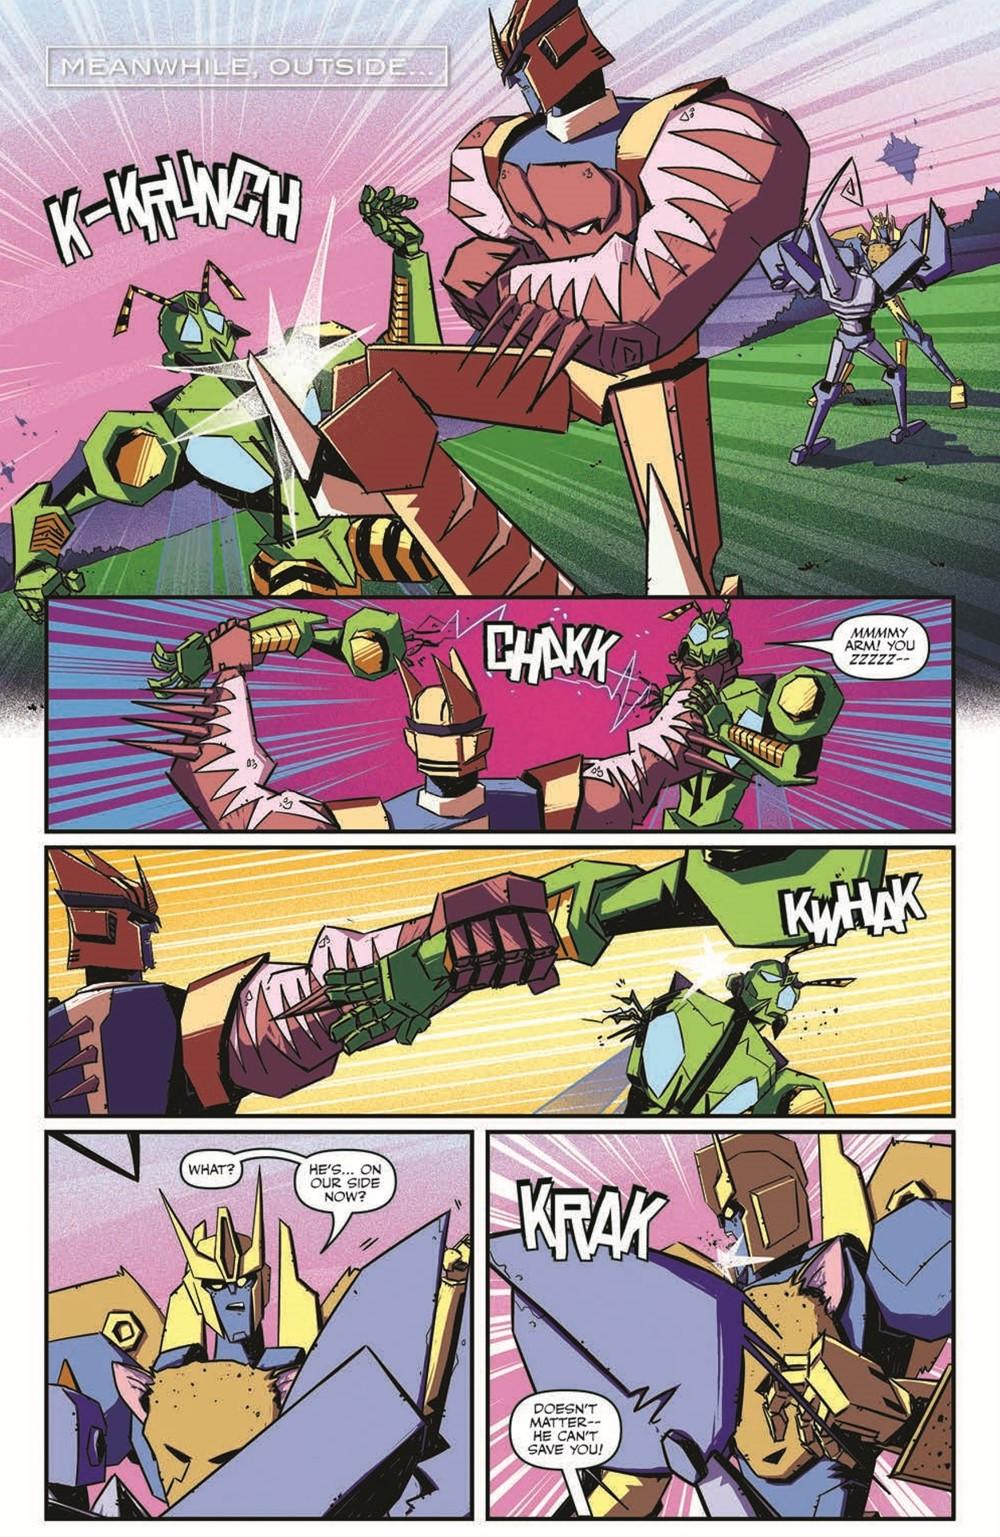 TFBW_06_pr-5 ComicList Previews: TRANSFORMERS BEAST WARS #6